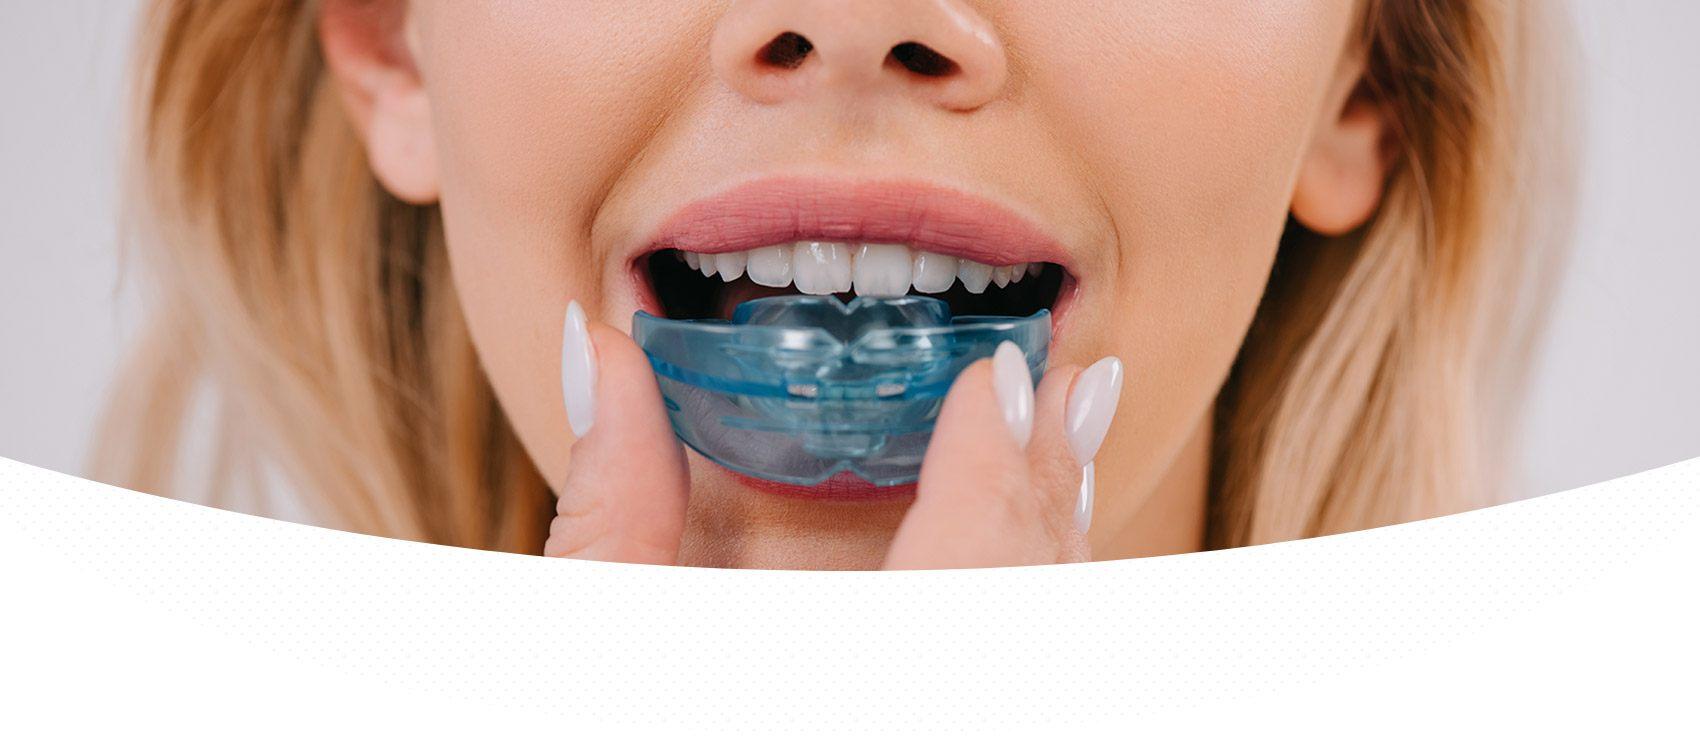 Orthodontics and Invisalign - North Aurora Smiles